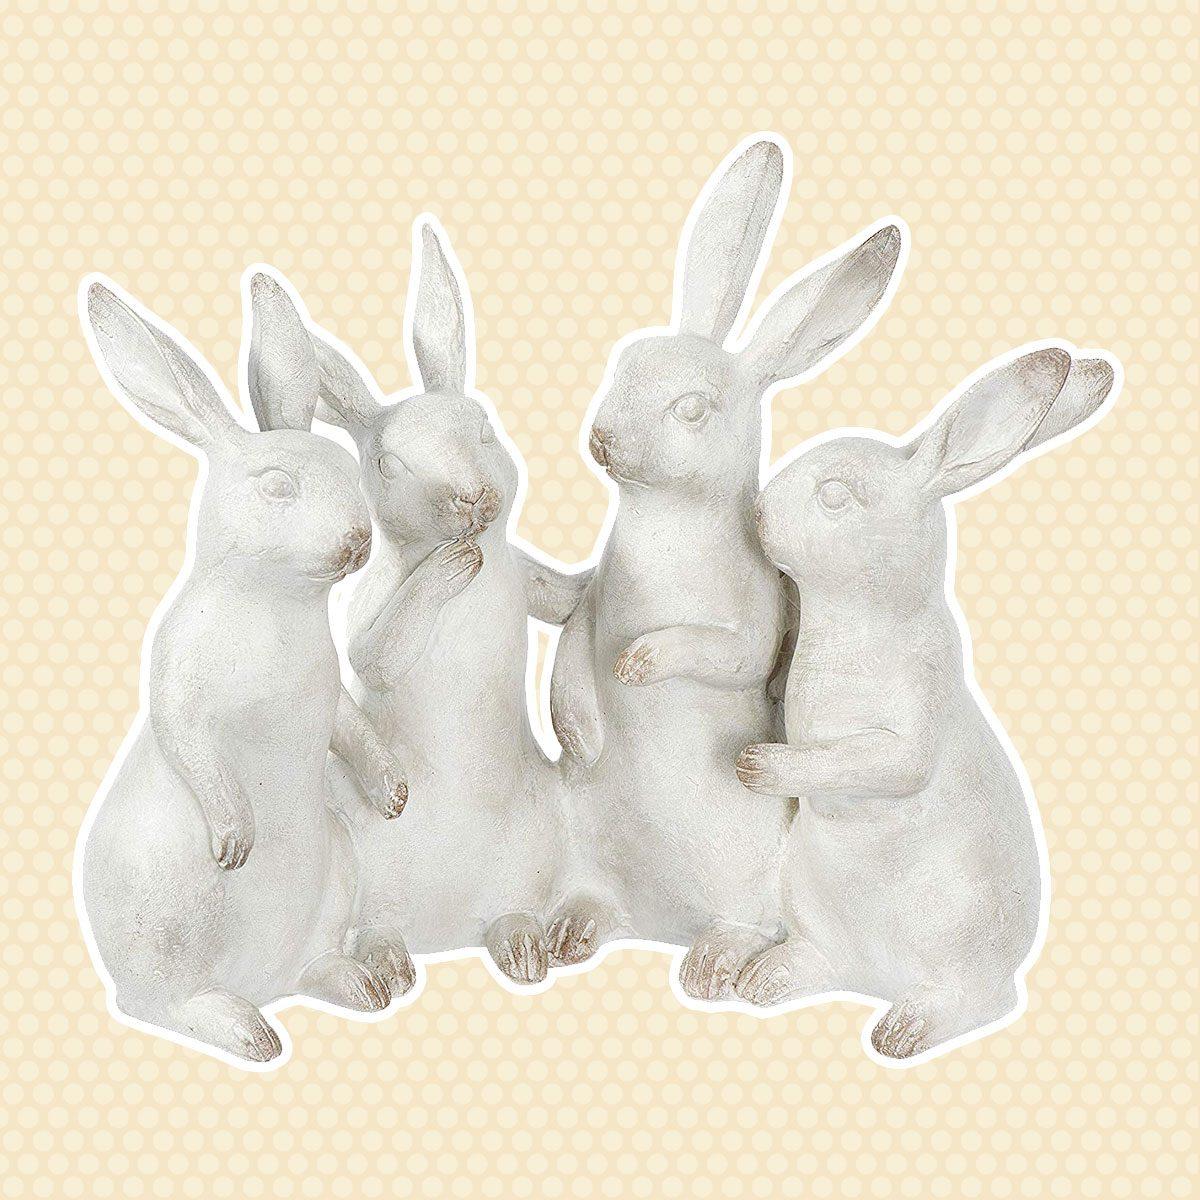 Bunny Rabbit Figurines vintage easter decorations